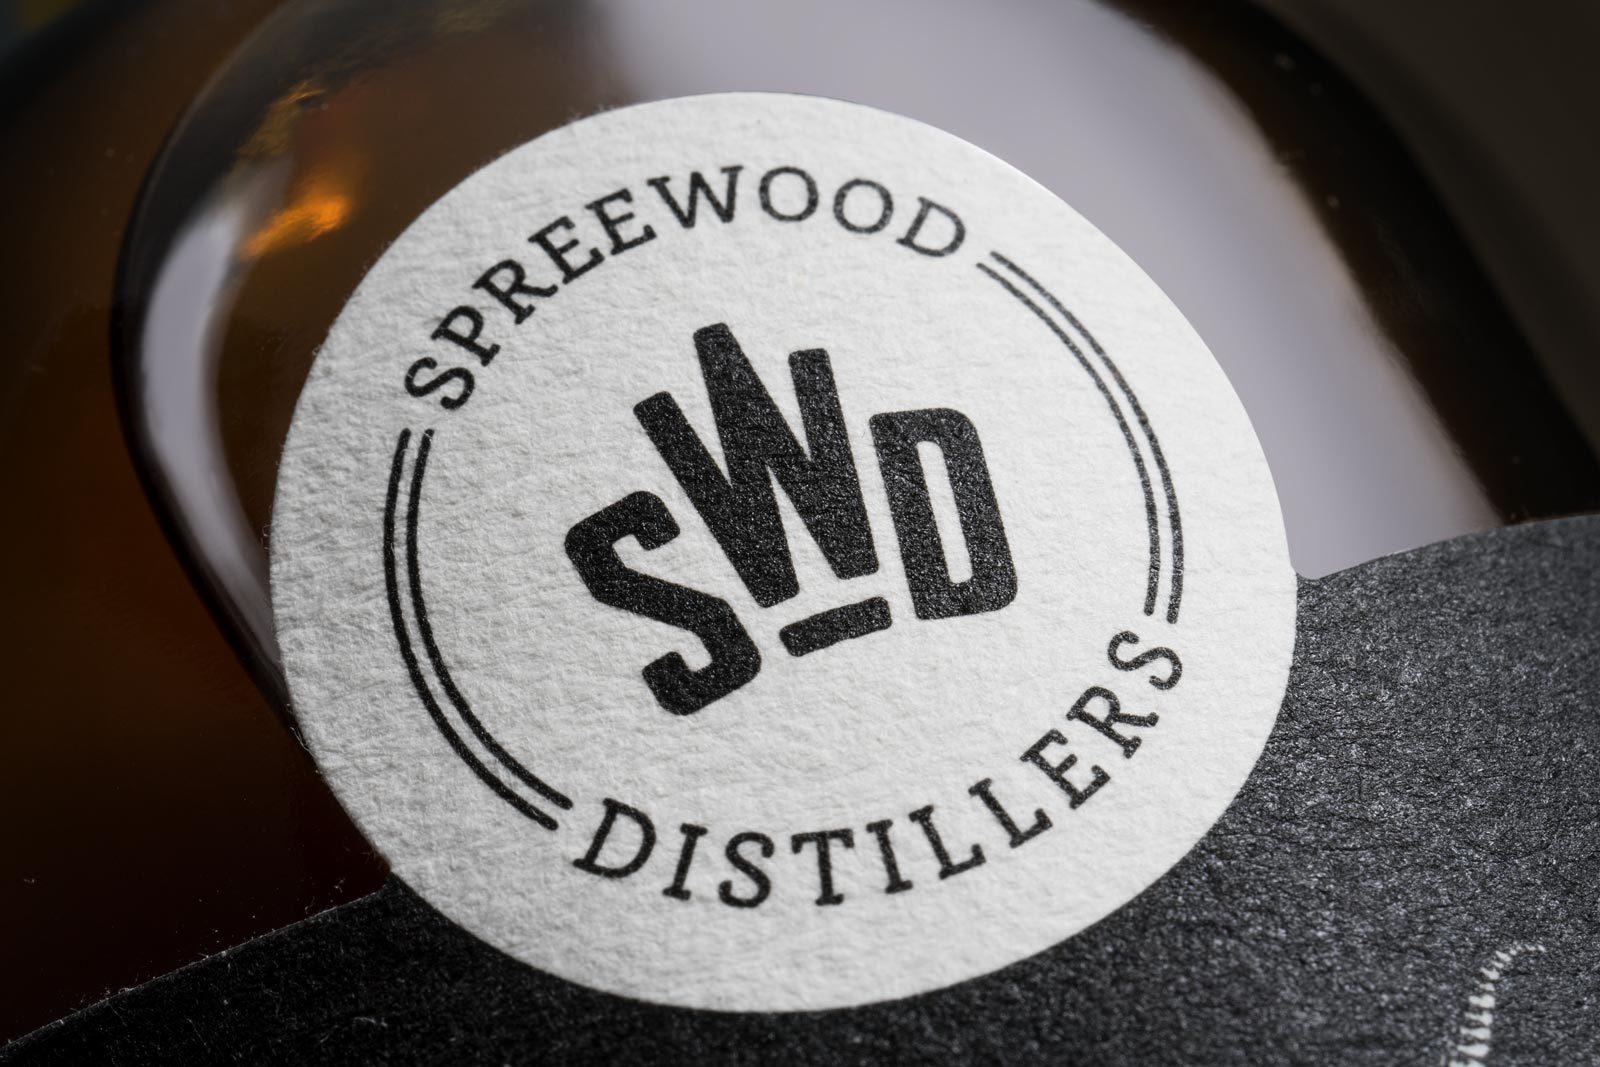 Editienne Grafikdesign - Kommunikationsdesign Berlin- Packaging Design Spreewood Distillers